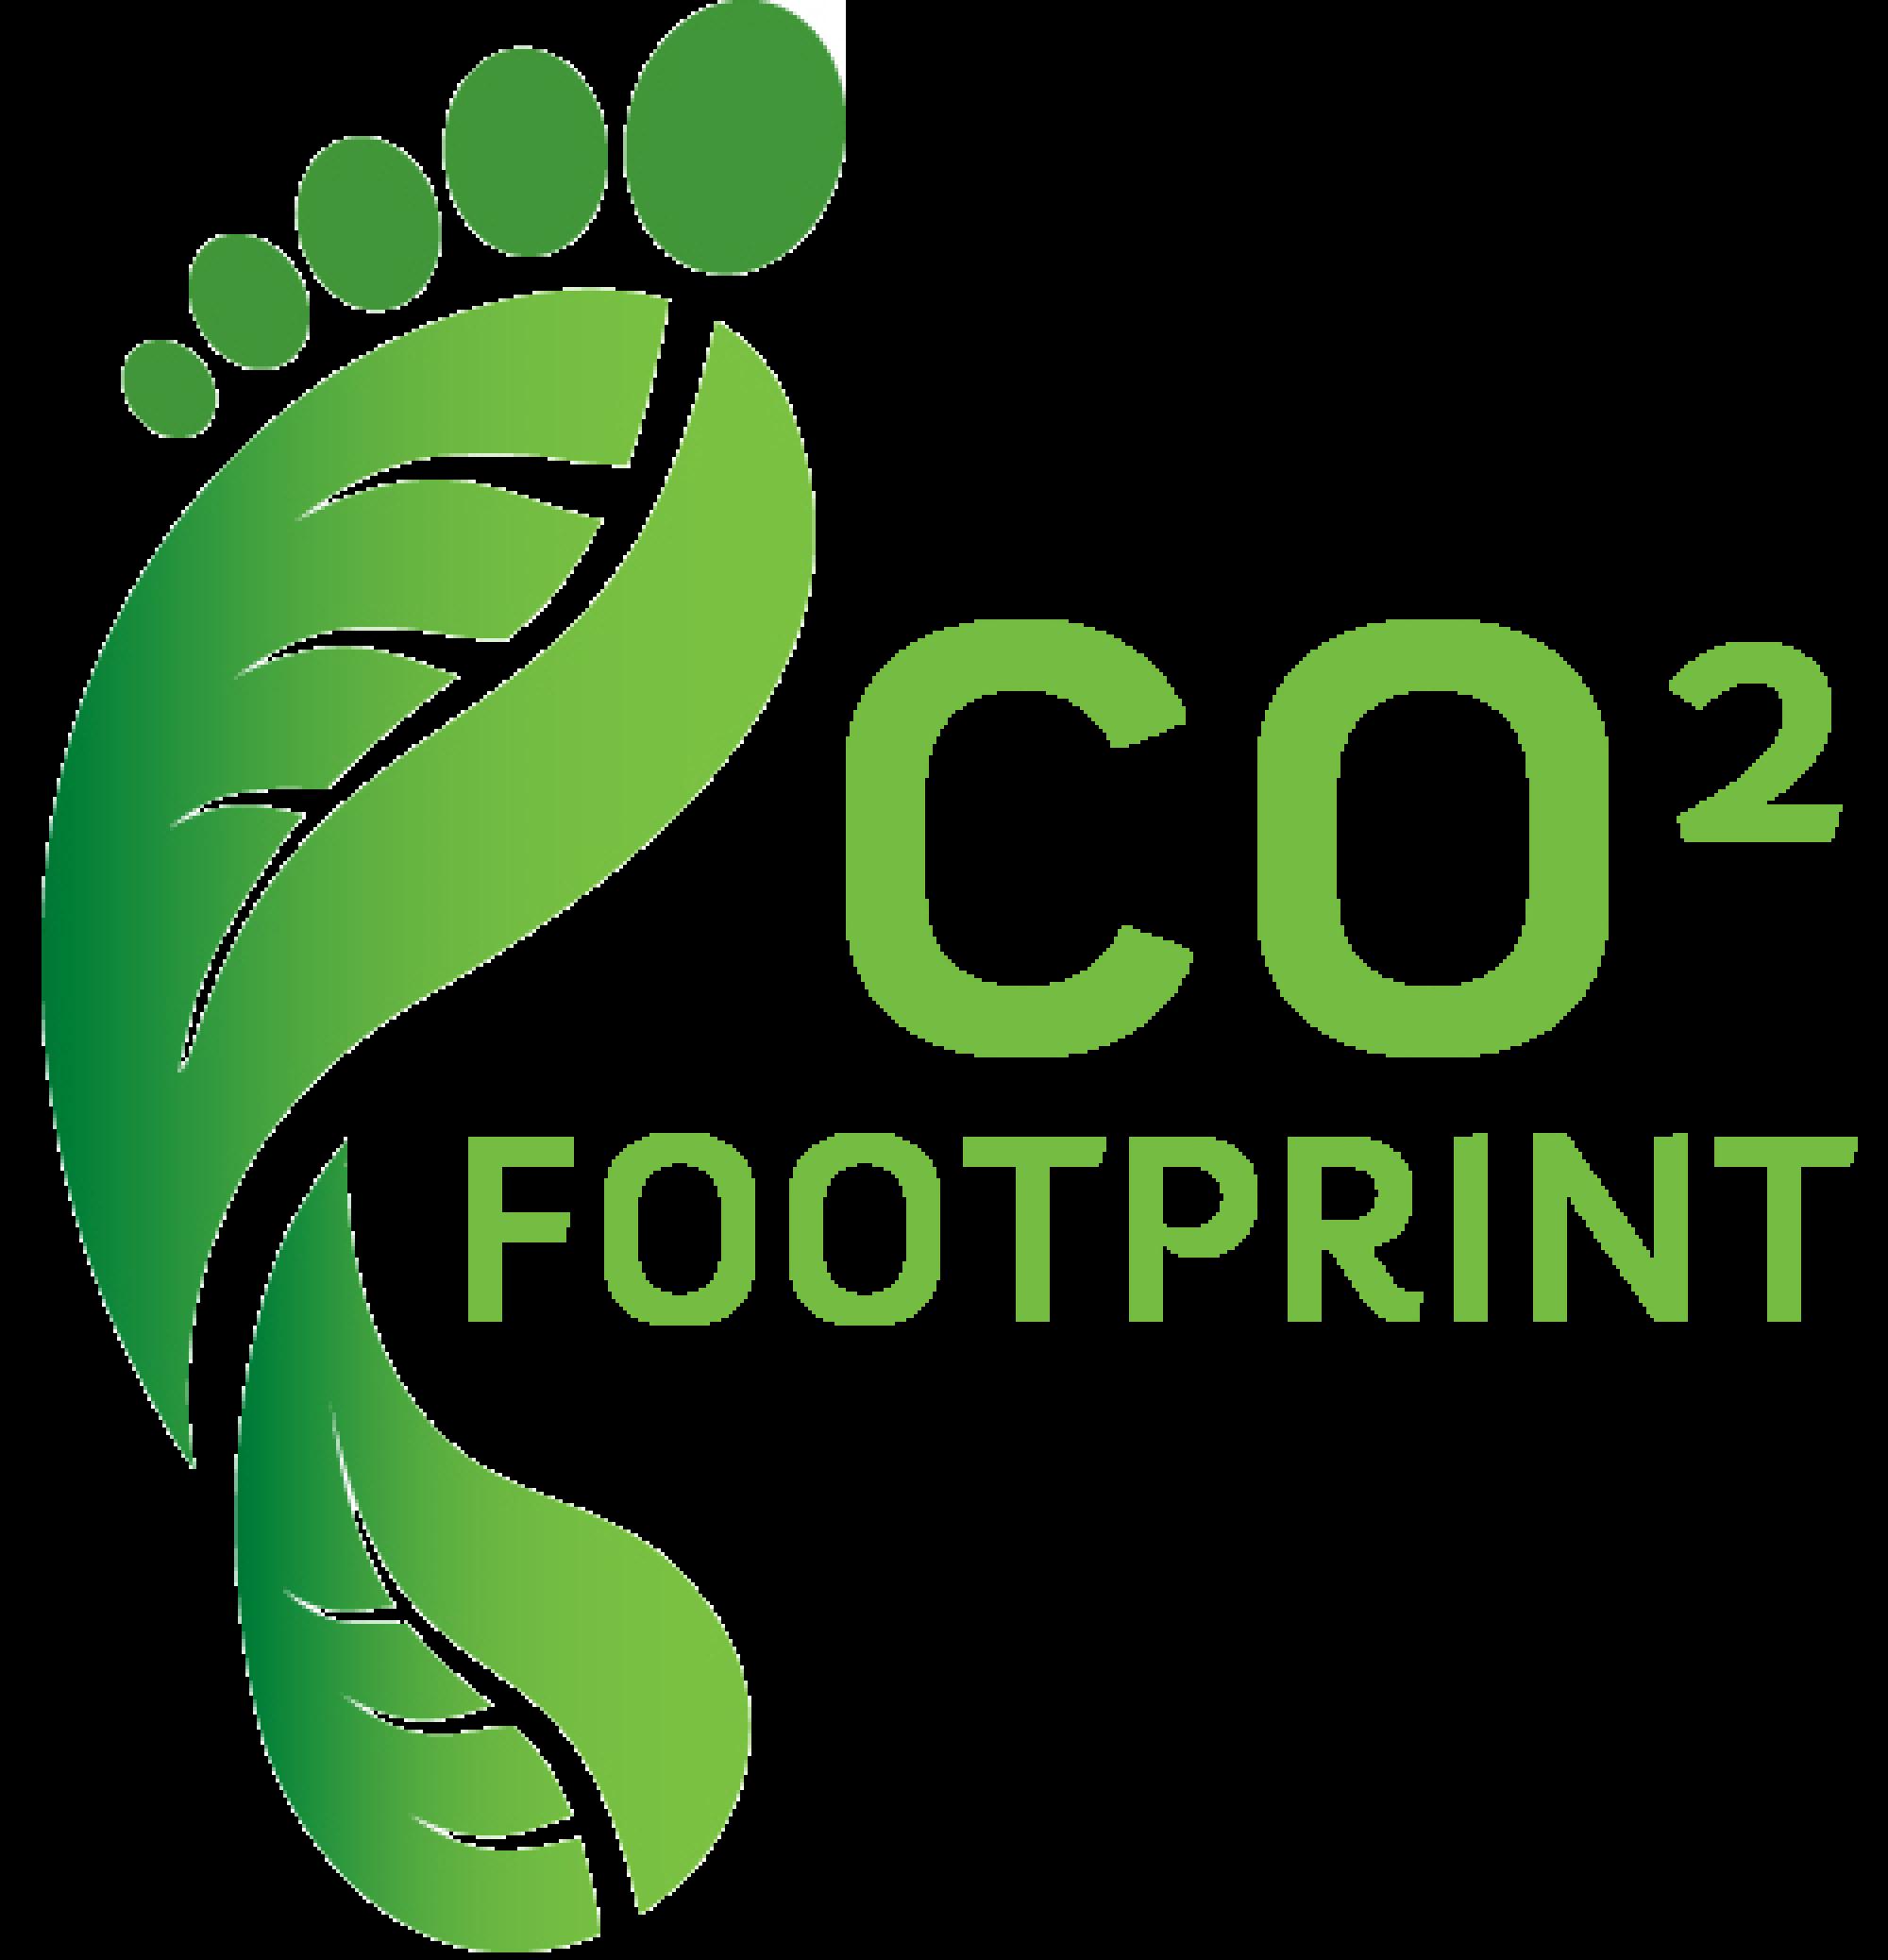 kisspng-carbon-footprint-ecological-footprint-low-carbon-e-footprint-5ac77fb42e42d8.7761300315230237961895